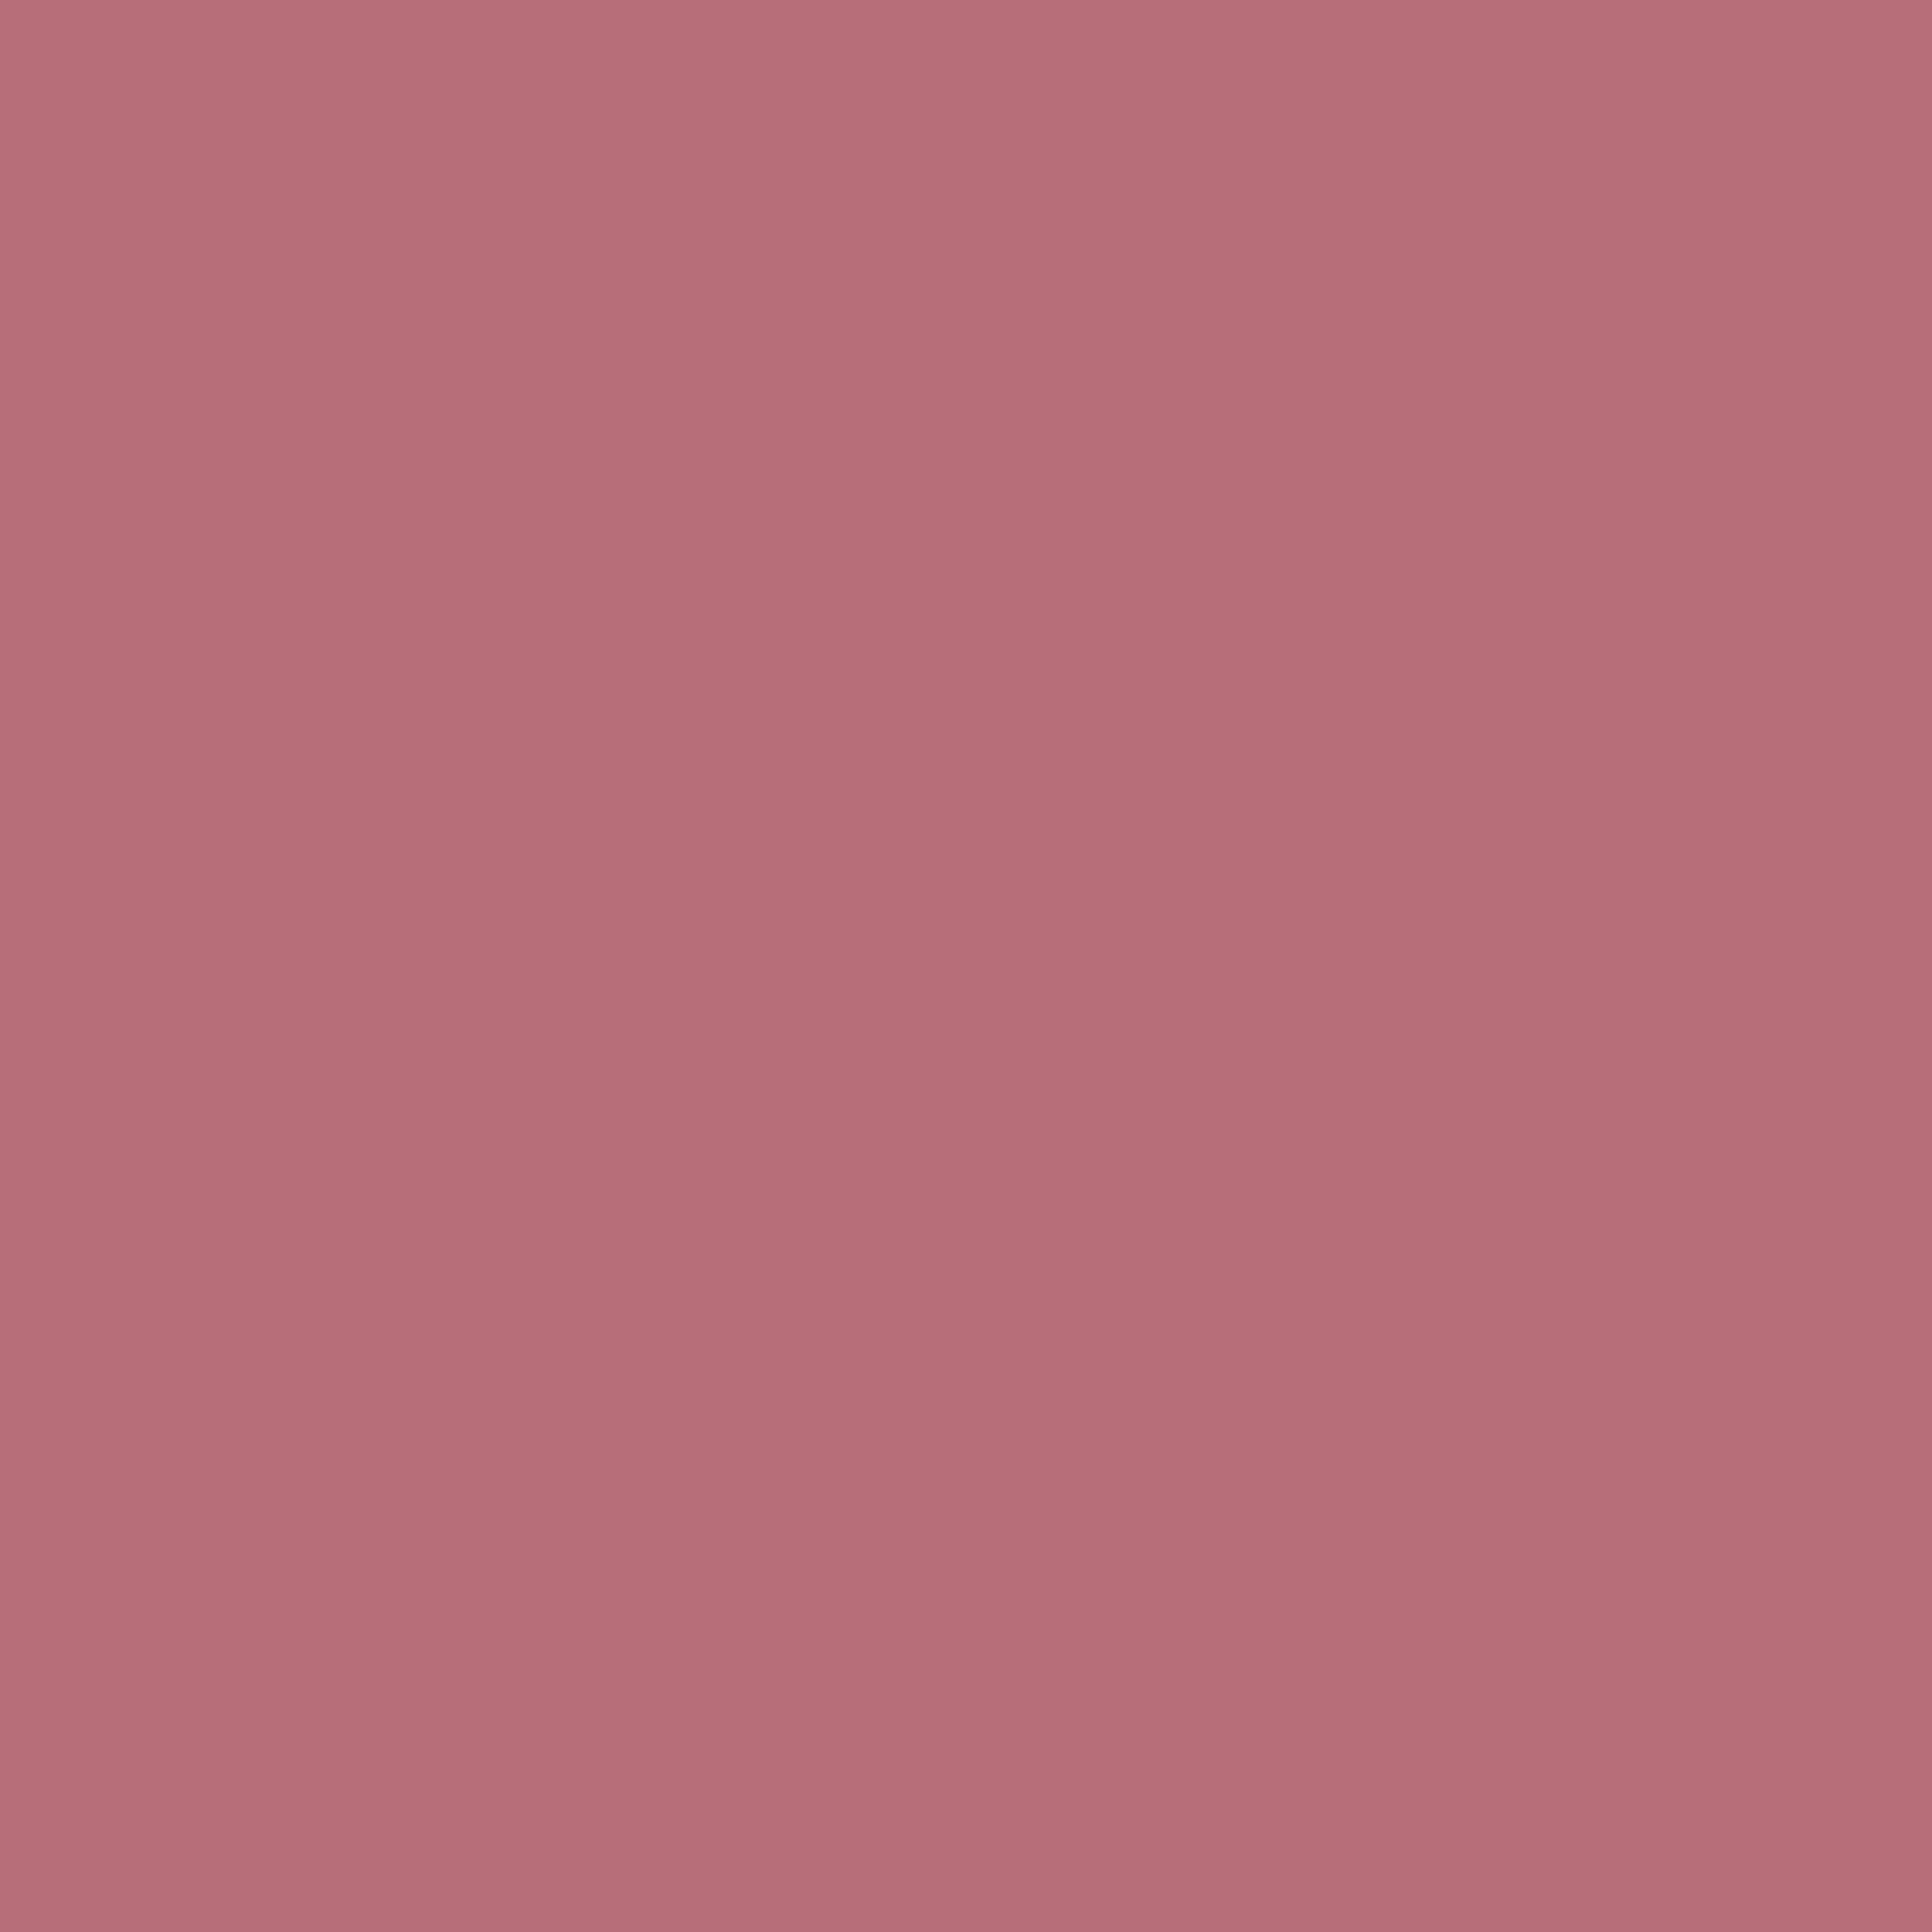 3600x3600 Rose Gold Solid Color Background